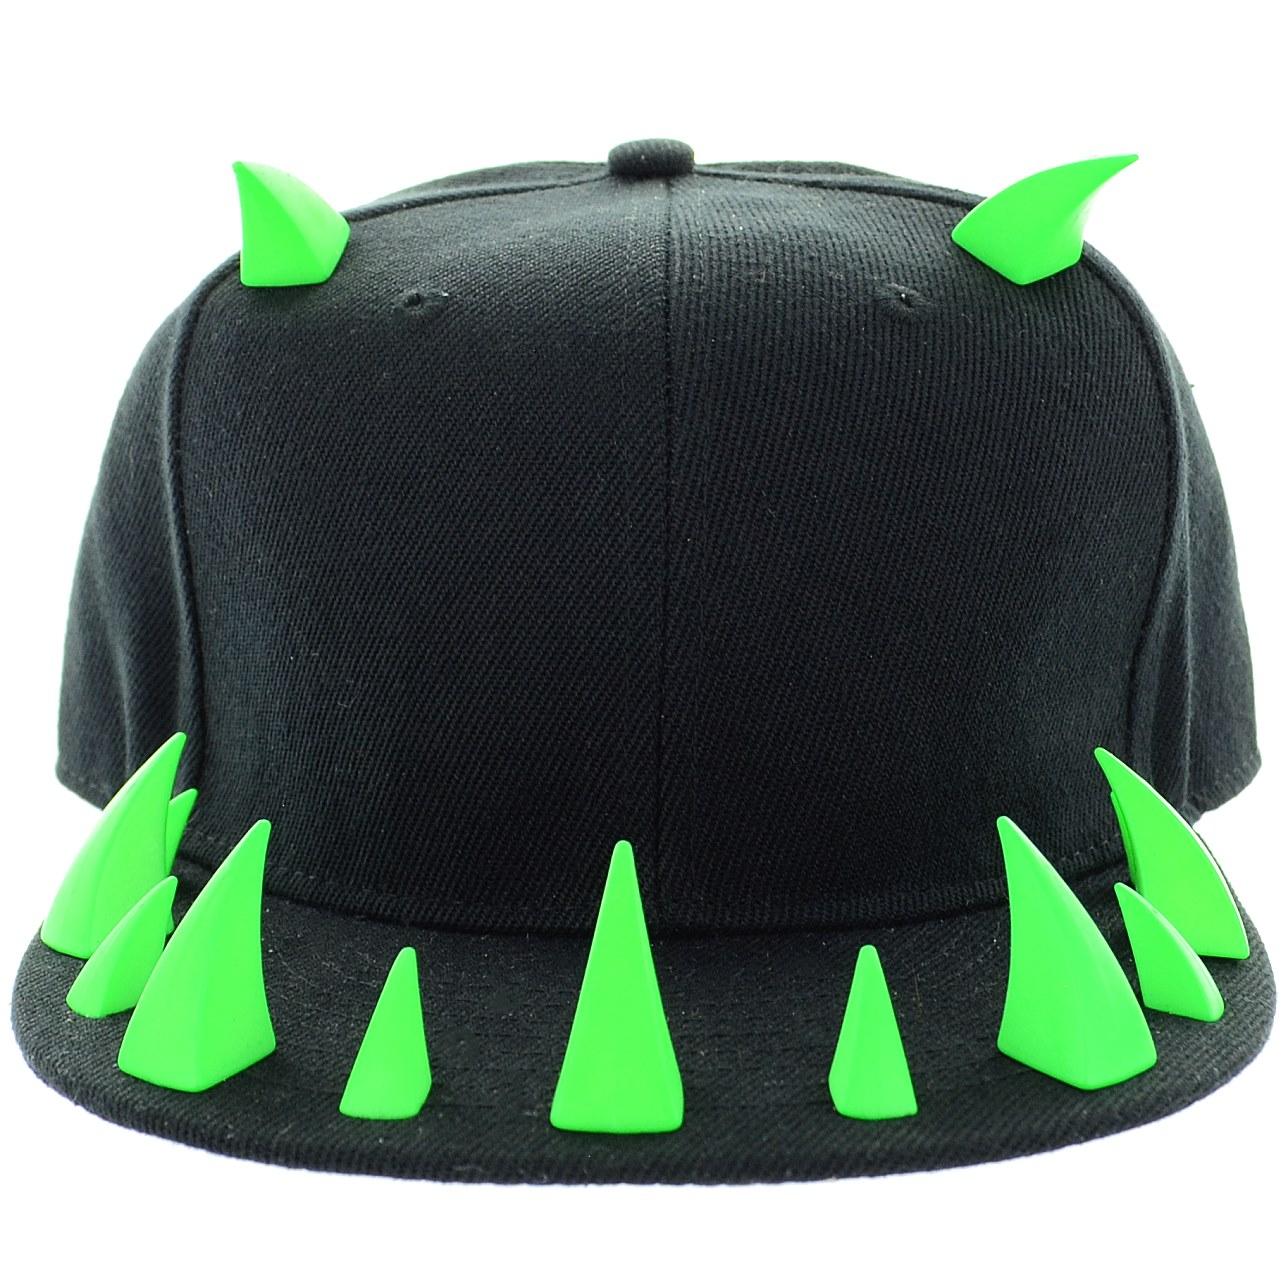 fa8c3d4cdbfe1 ... Unsex Neon Horn Baseball Cap ...